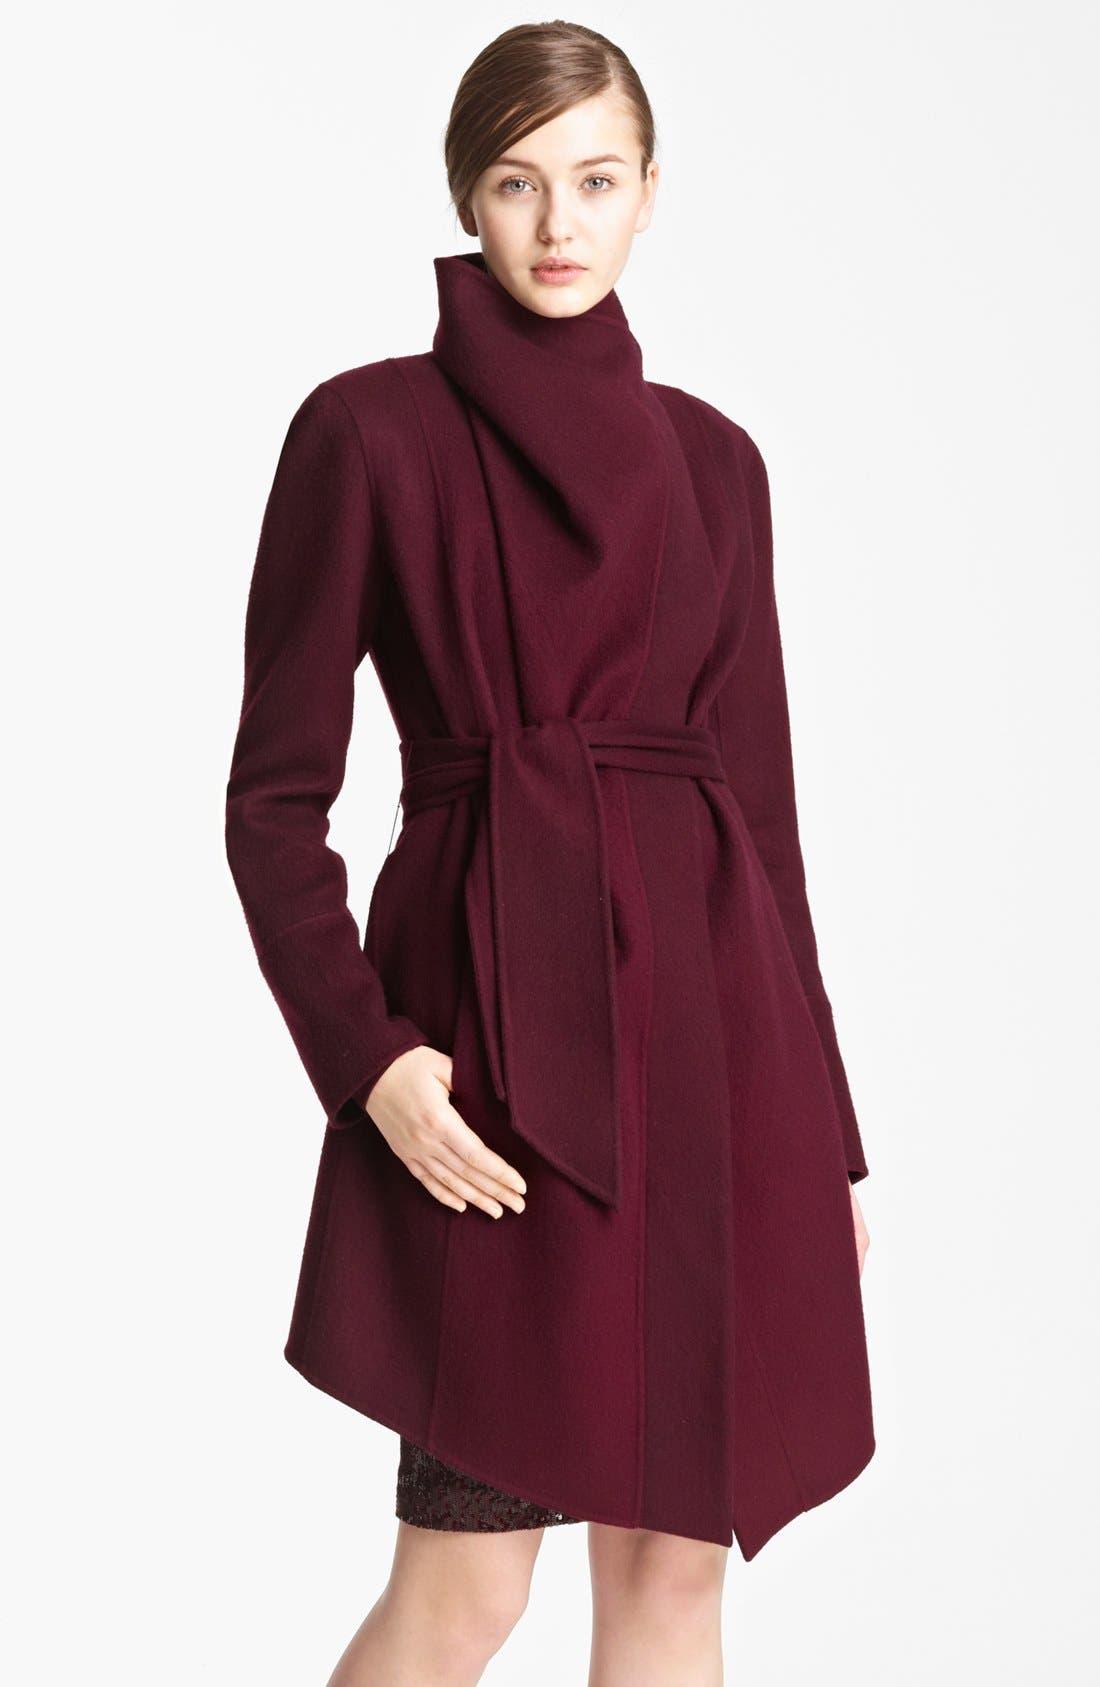 Alternate Image 1 Selected - Donna Karan Collection Belted Cashmere Coat